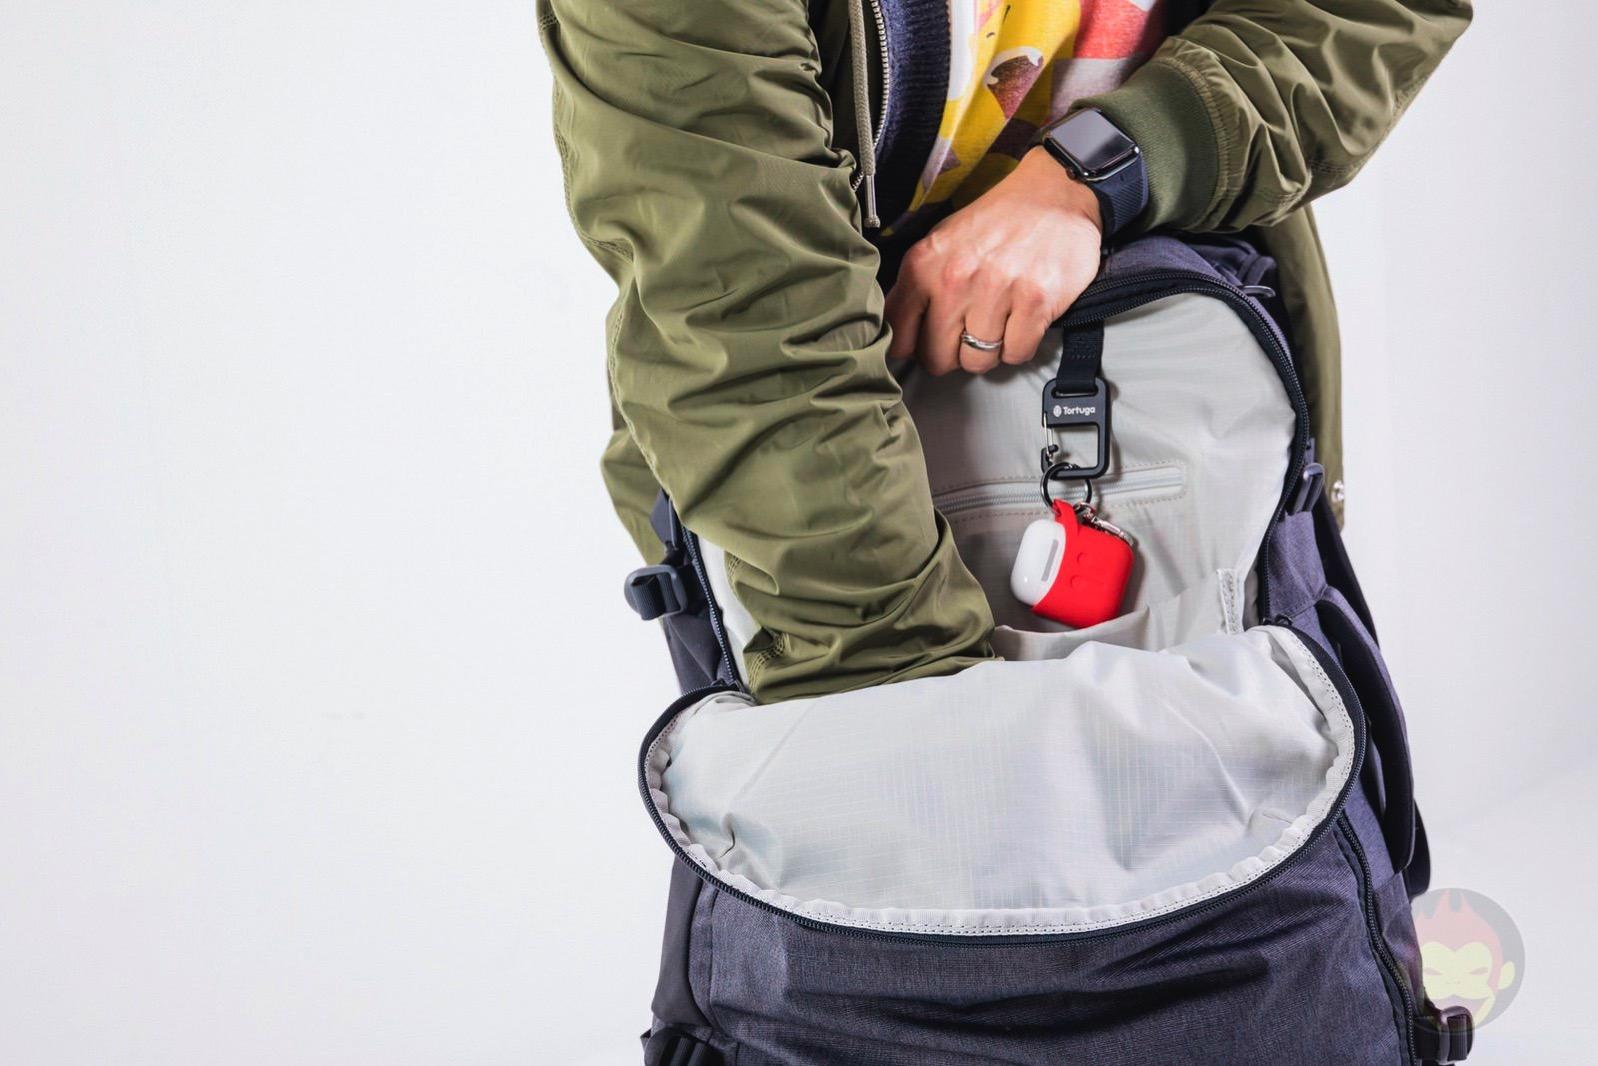 Tortuga-Setout-Backpack-35liter-review-17.jpg